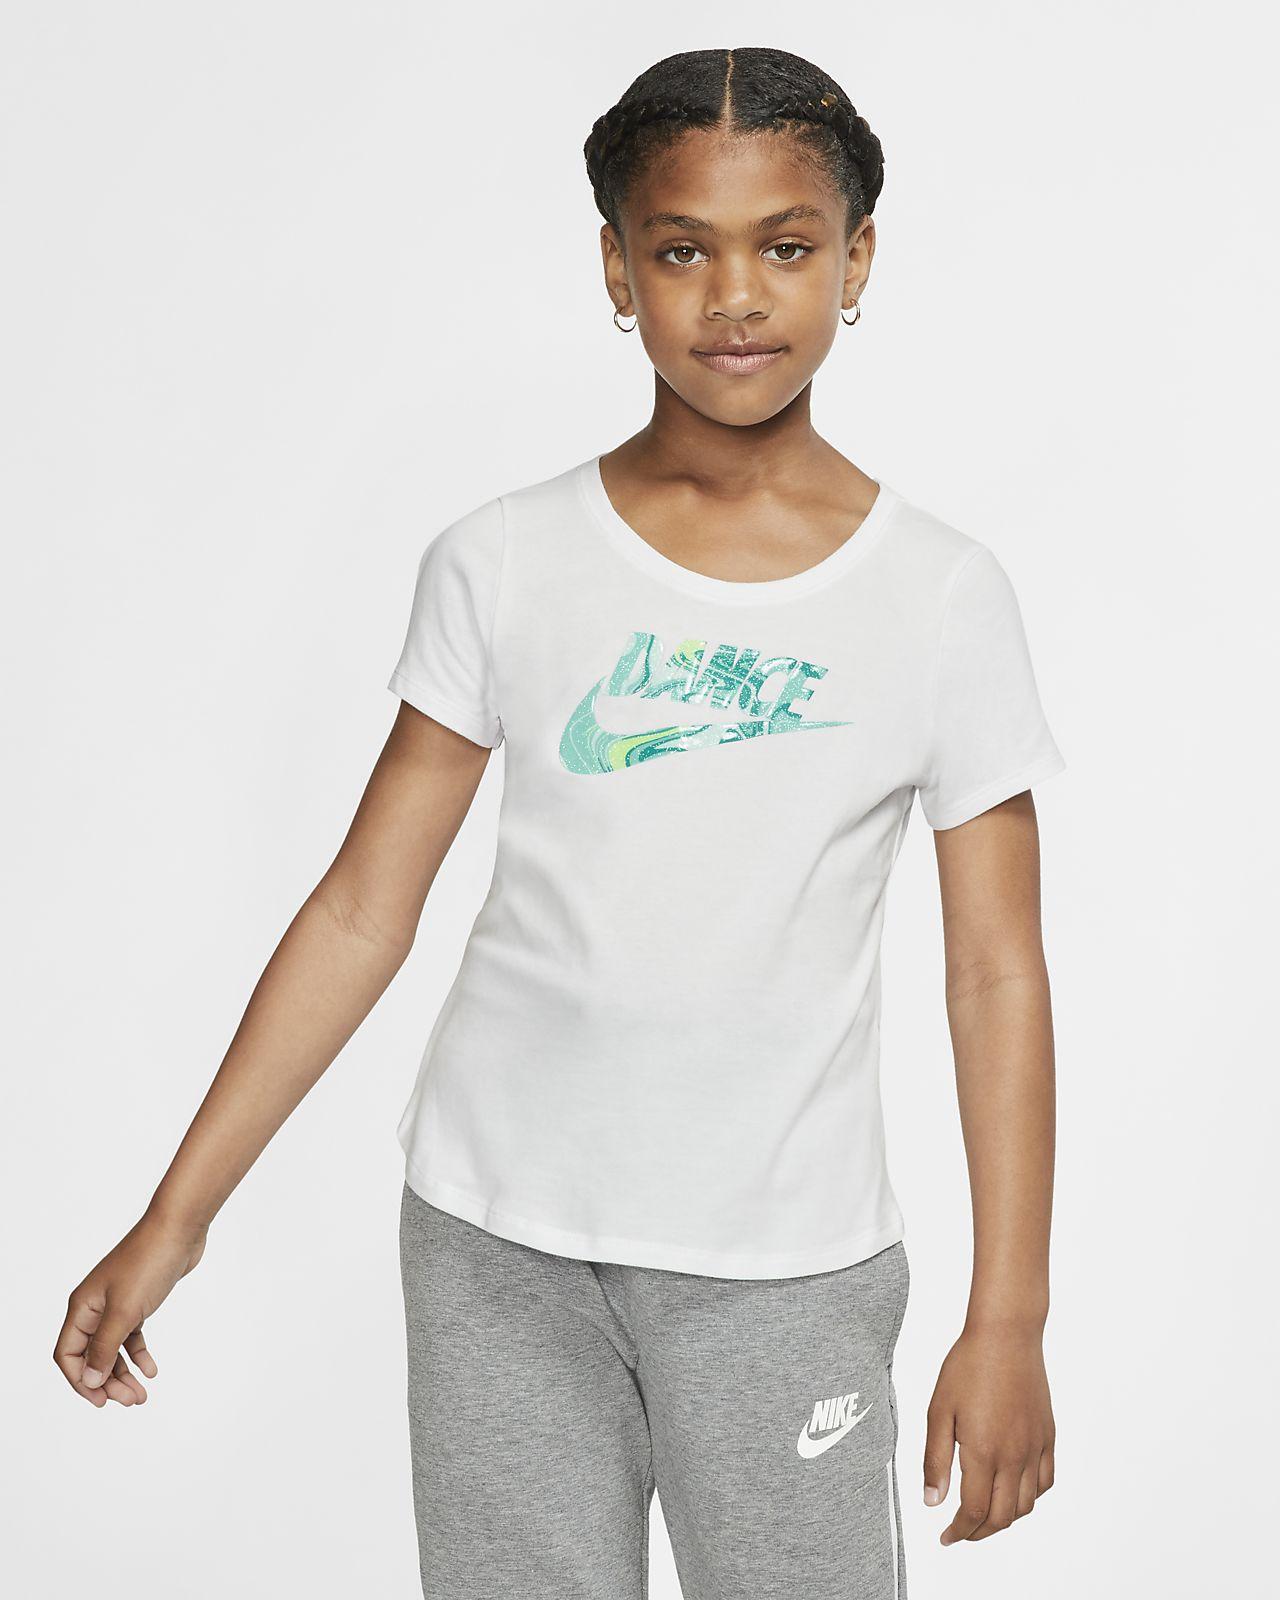 f29e0abef1 Nike Dri-FIT Big Kids' (Girls') Training T-Shirt. Nike.com